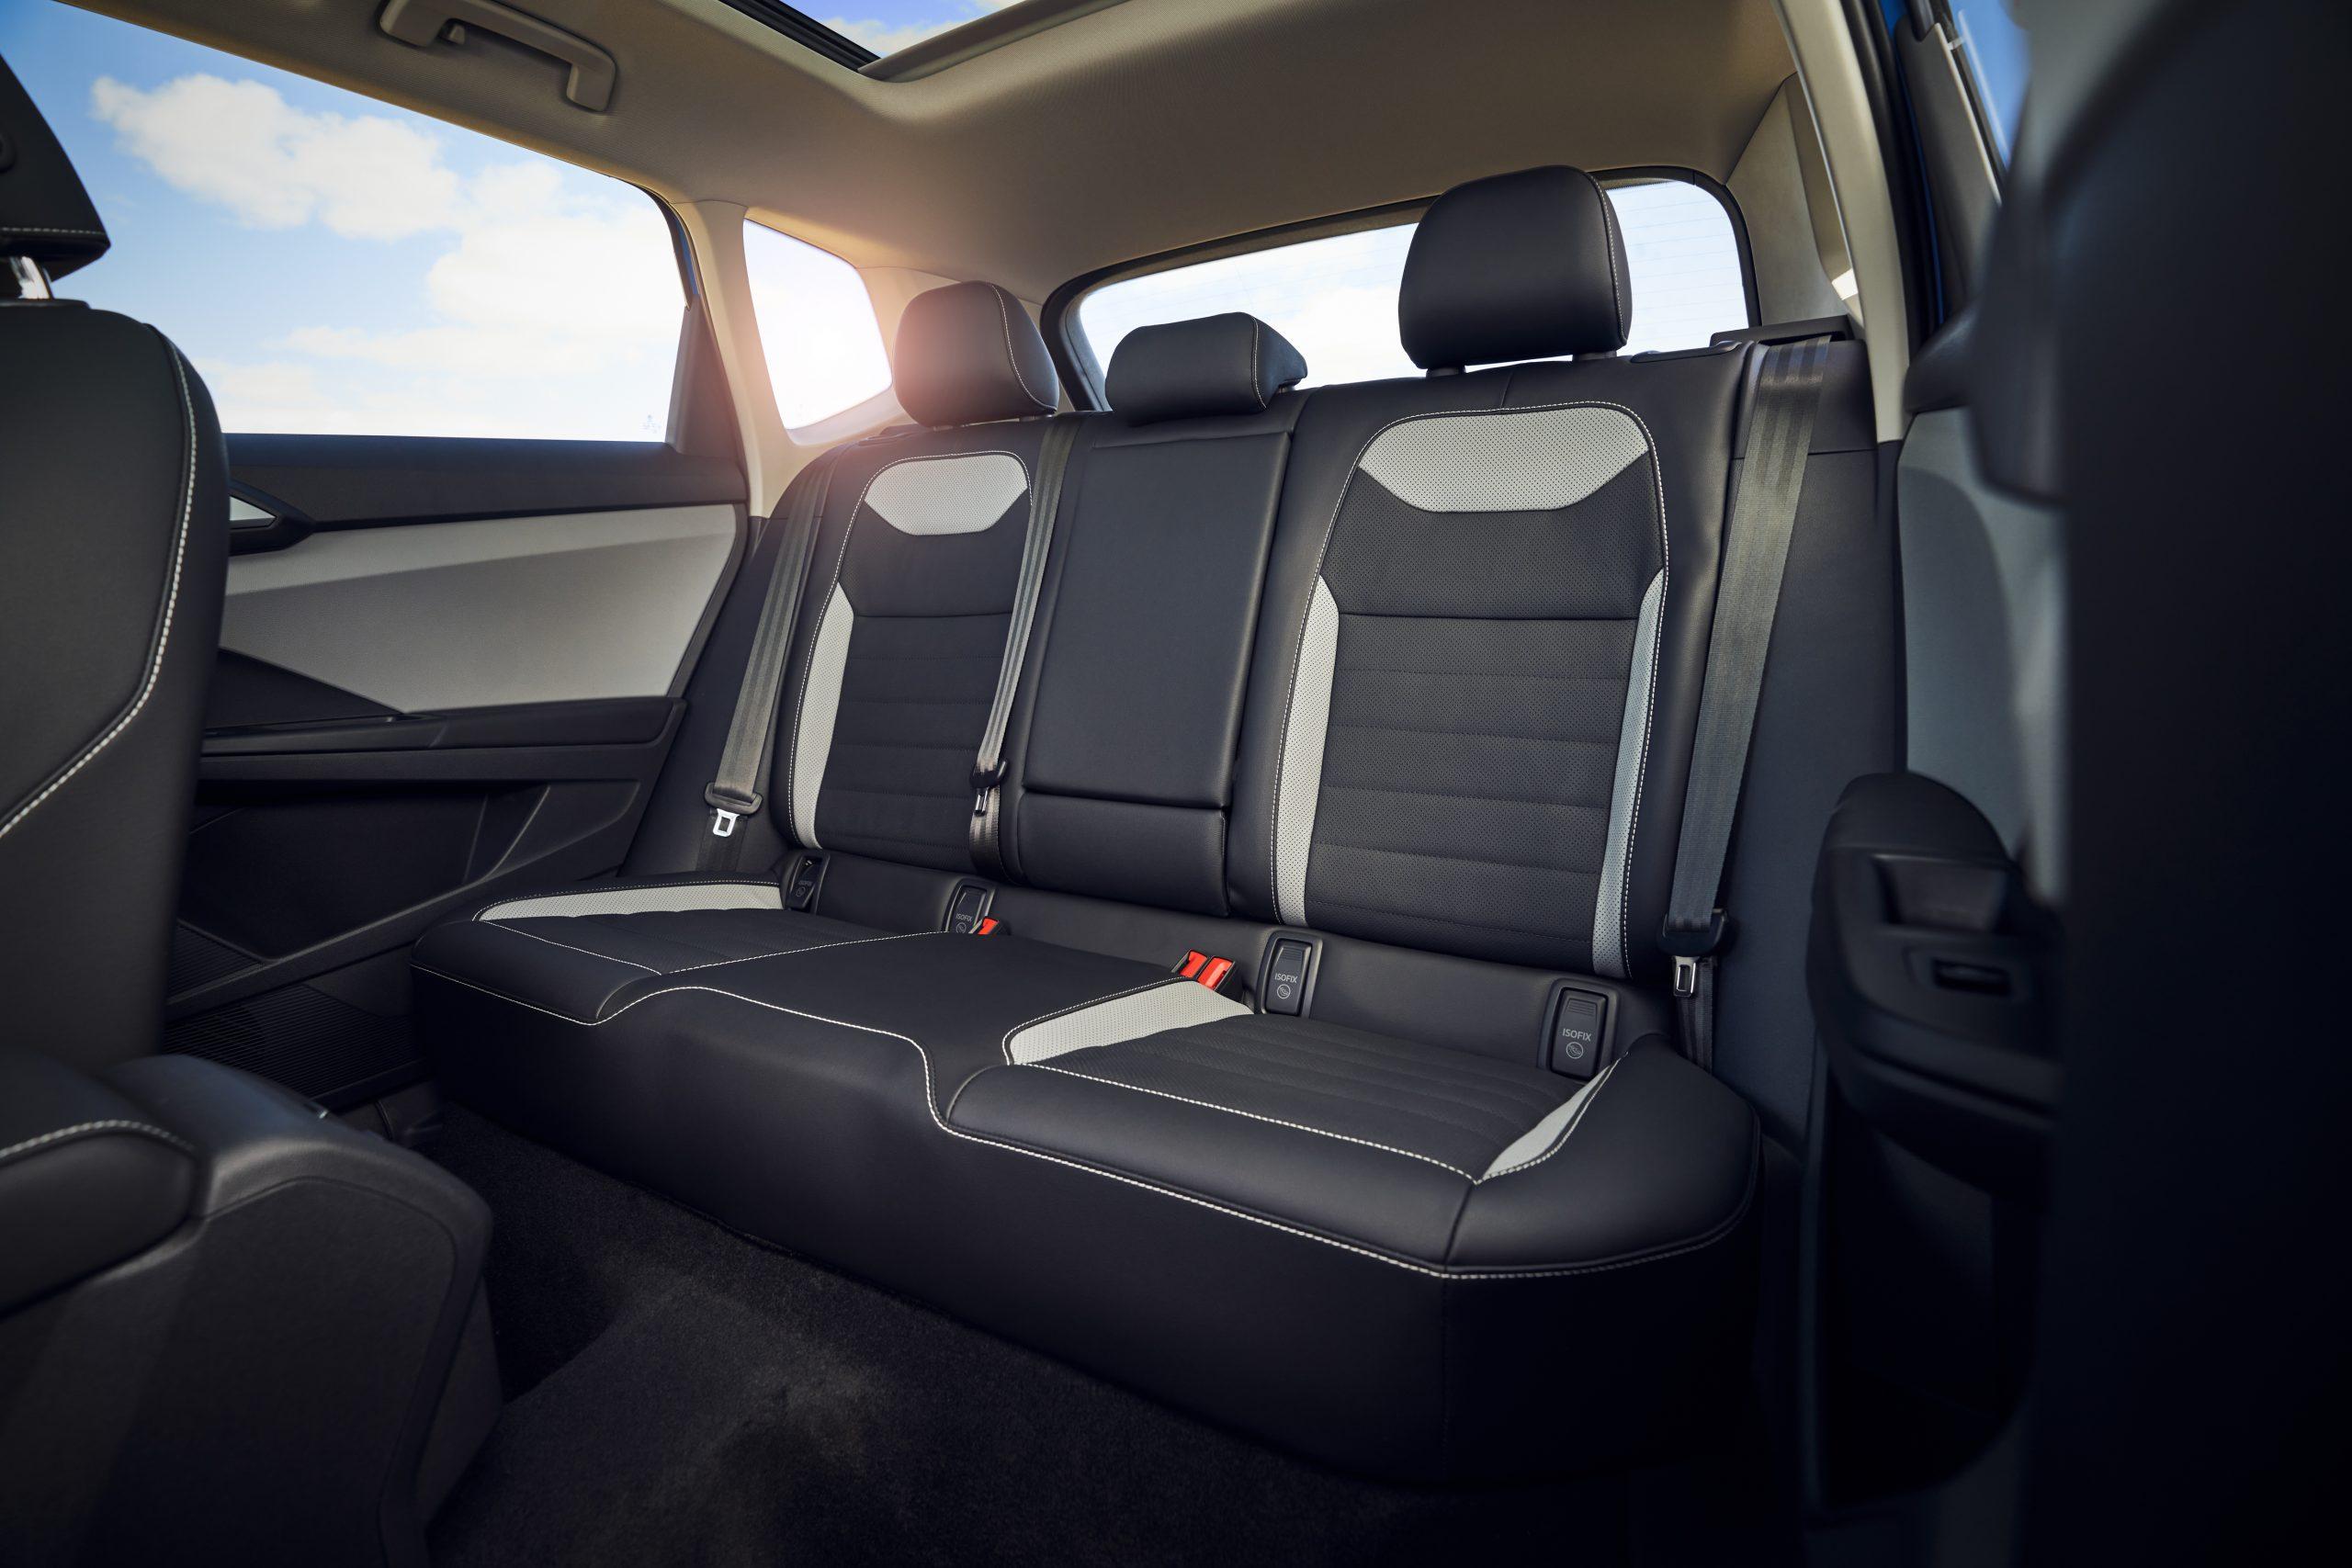 2022 Volkswagen Taos interior rear seat